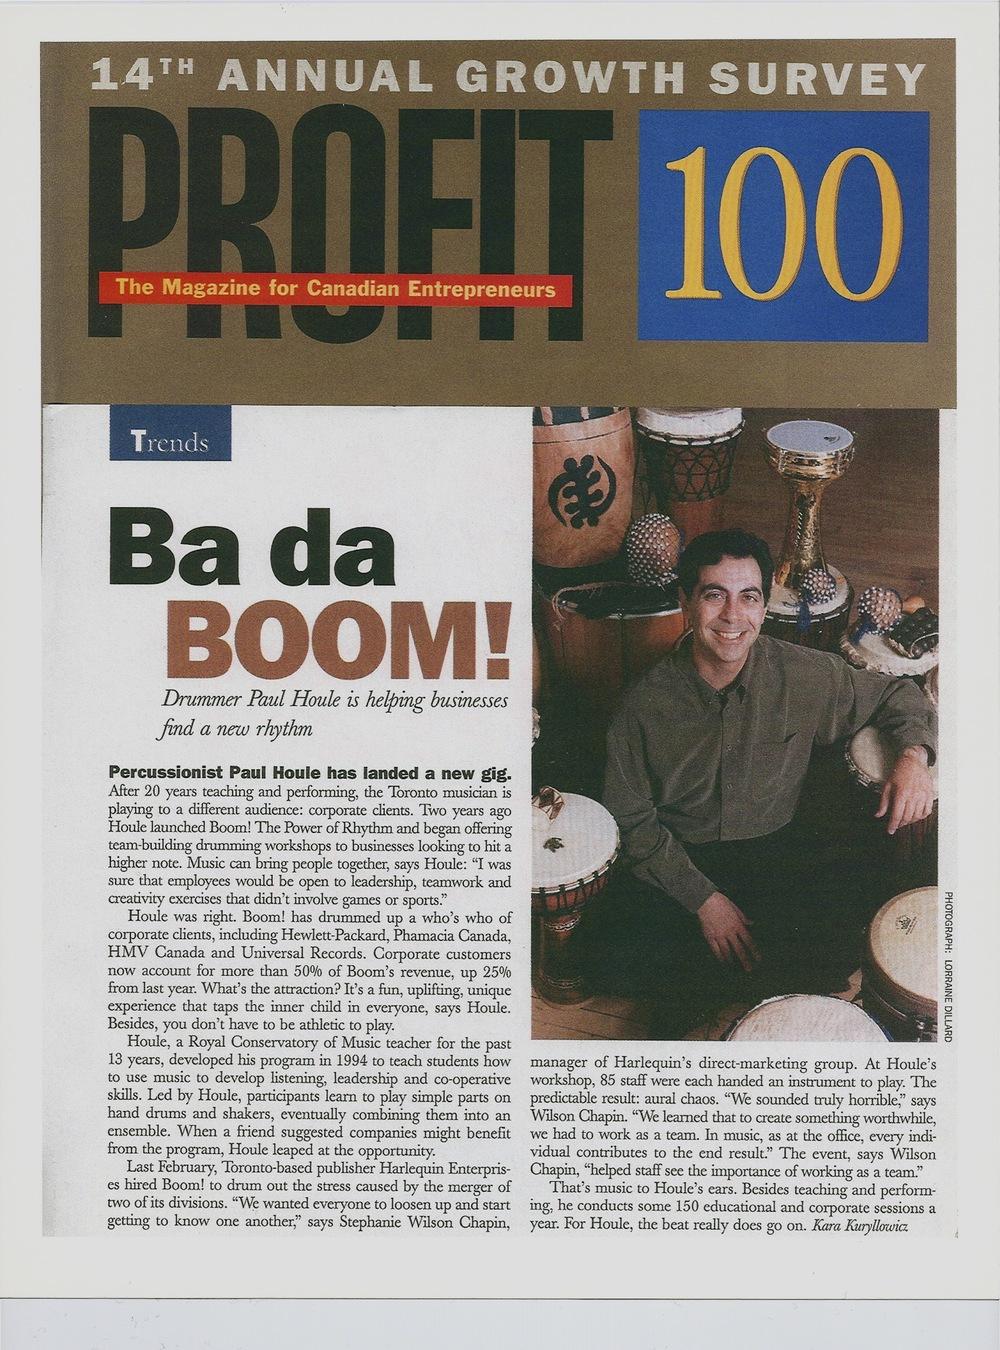 Ba Da BOOM! - Profit Magazine.jpg